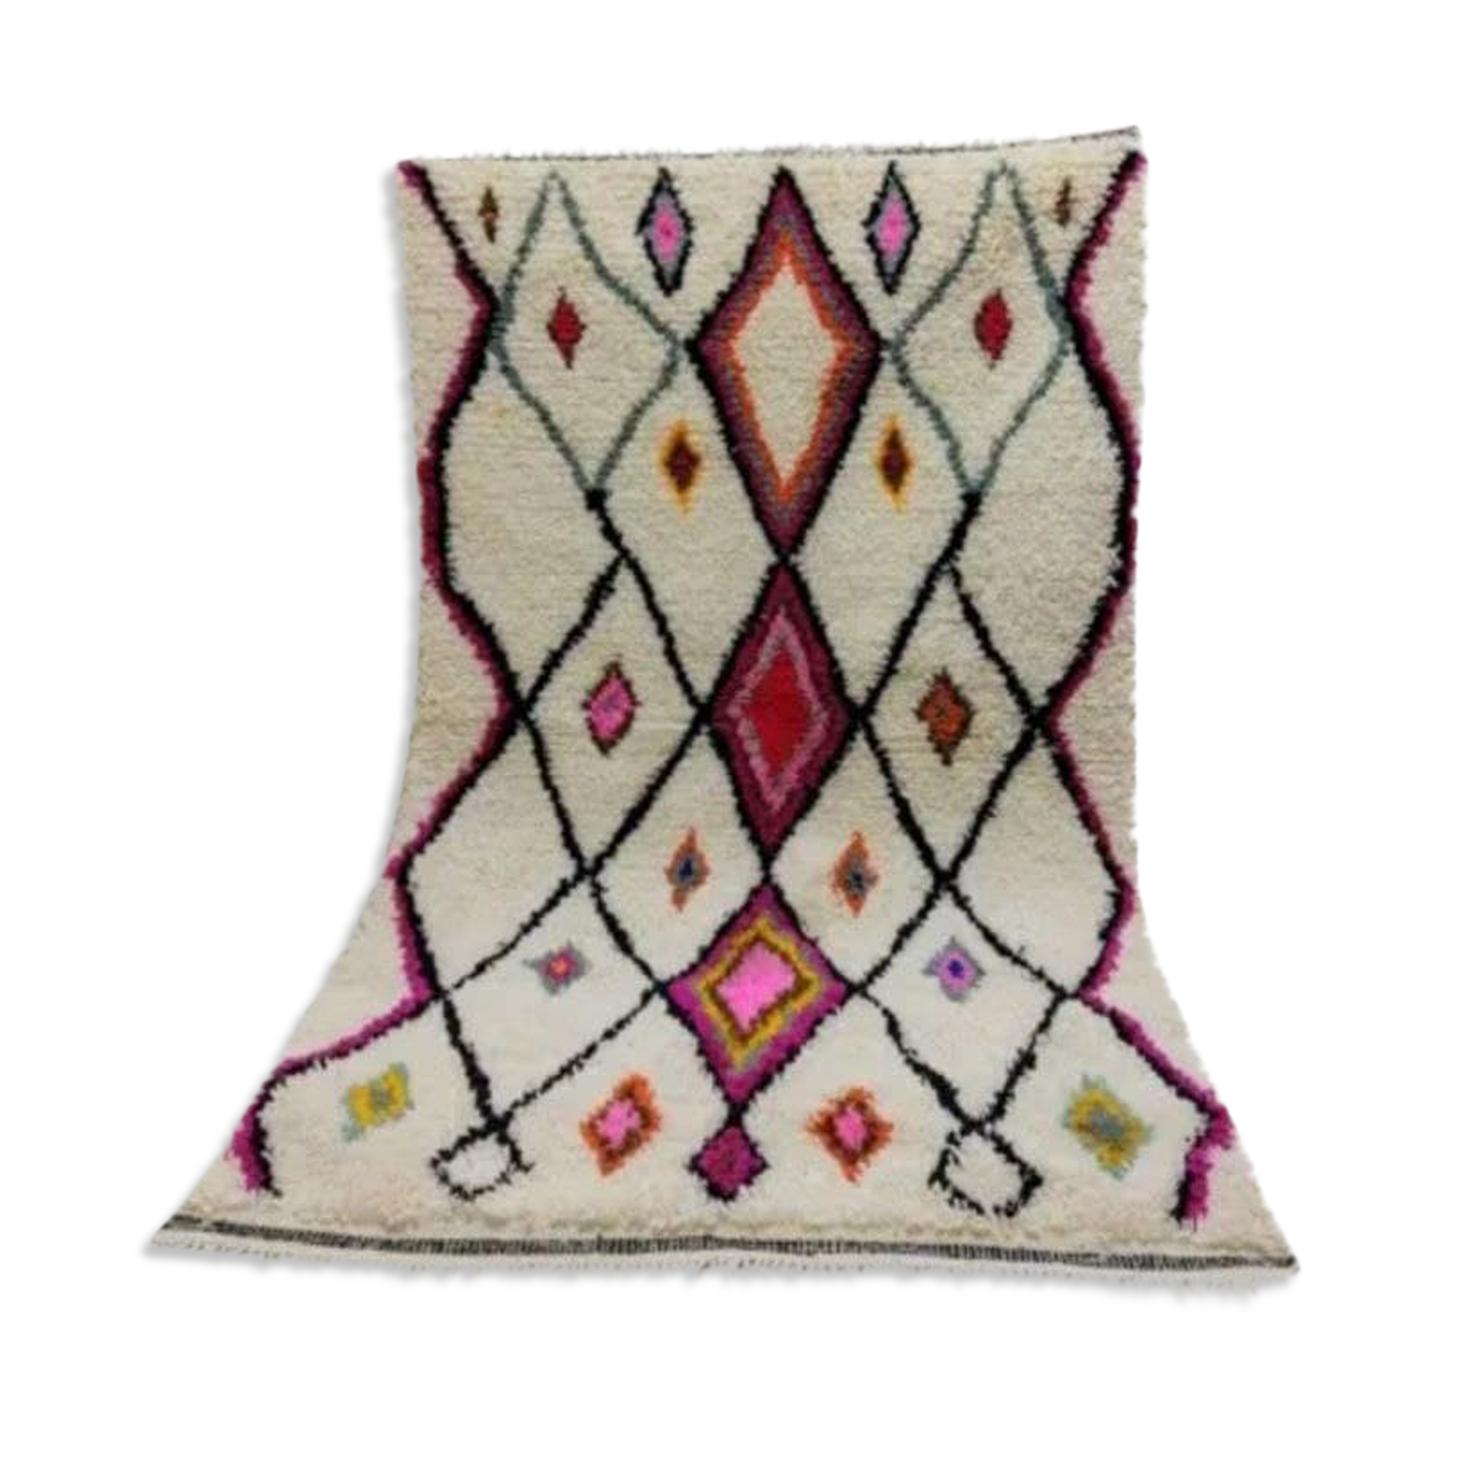 Tapis berbere marocain 163x110cm